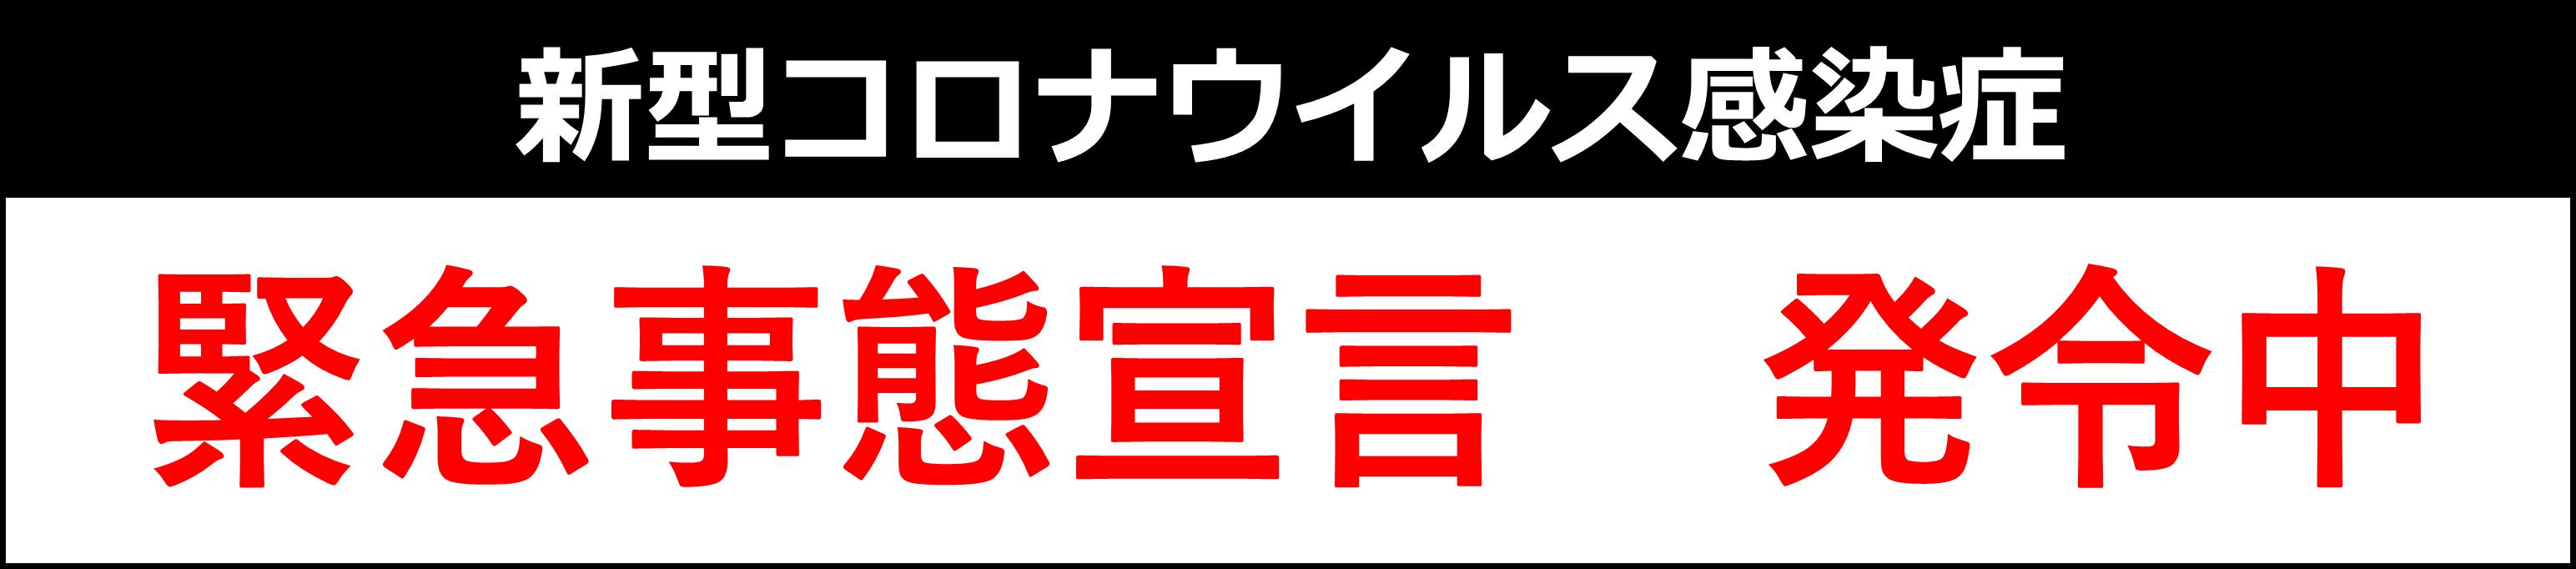 R3.8.27~ 緊急事態宣言